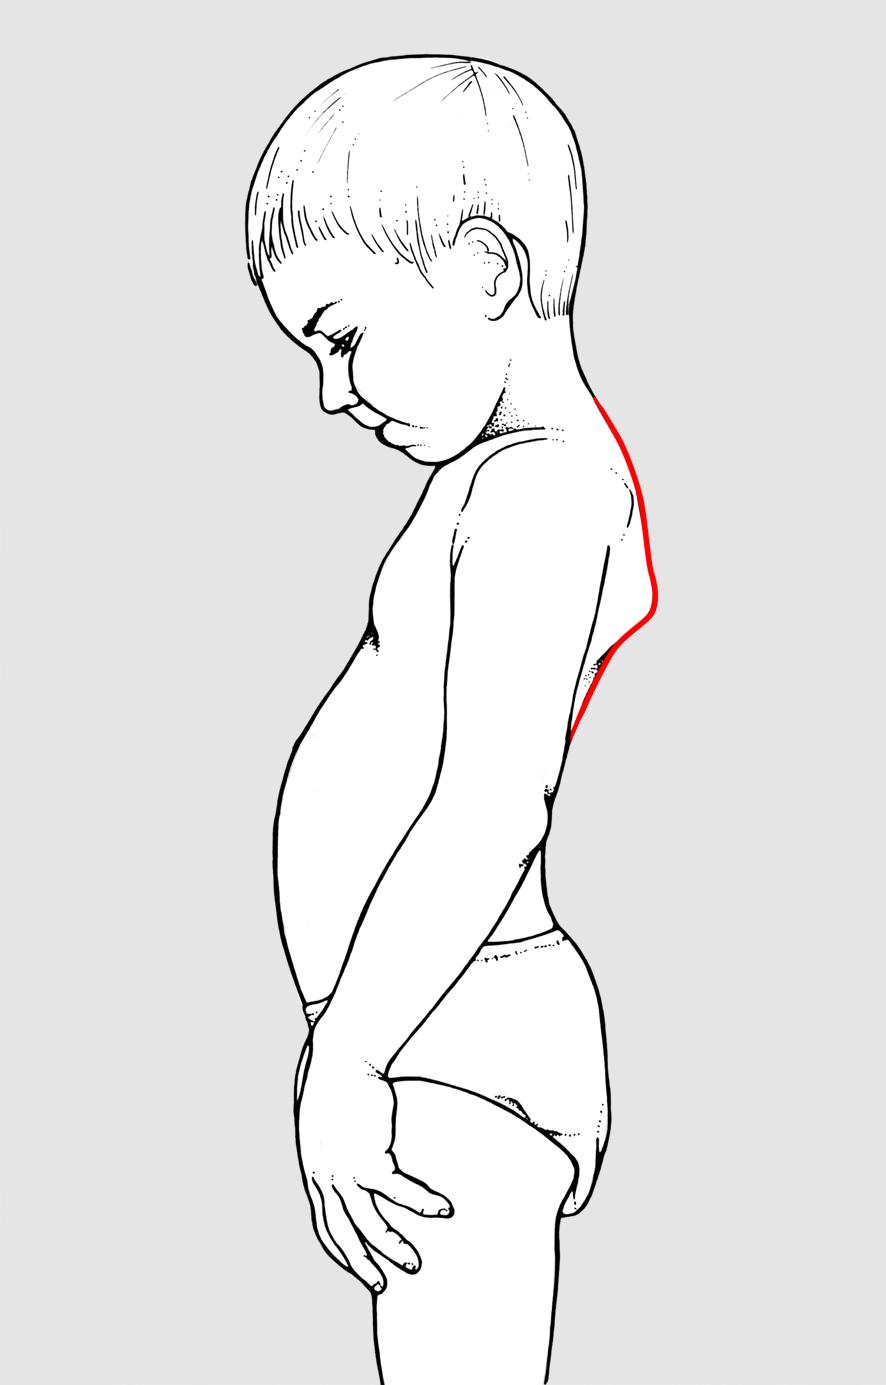 Mal di schiena di sintomi in polmoni